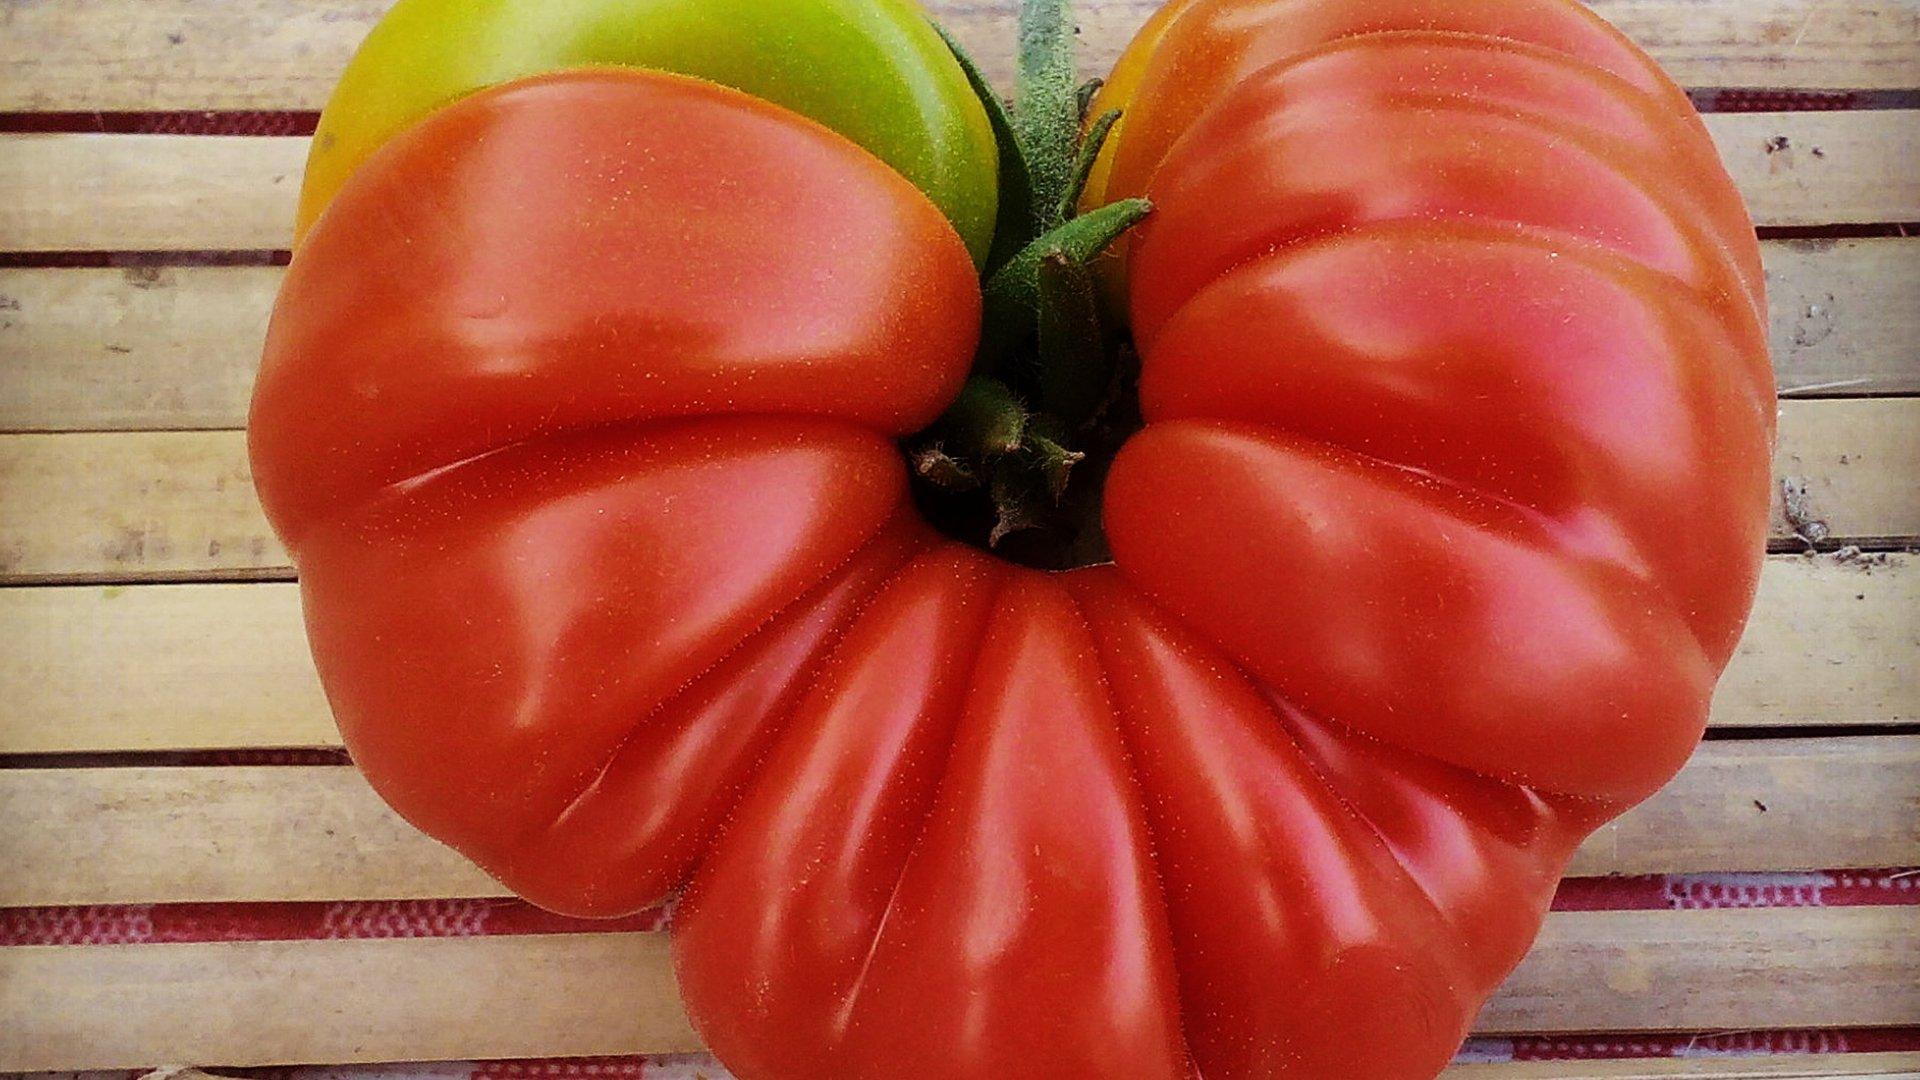 Tomato - L'imaGiraphe on Flickr (Creative Commons - AT-SA)